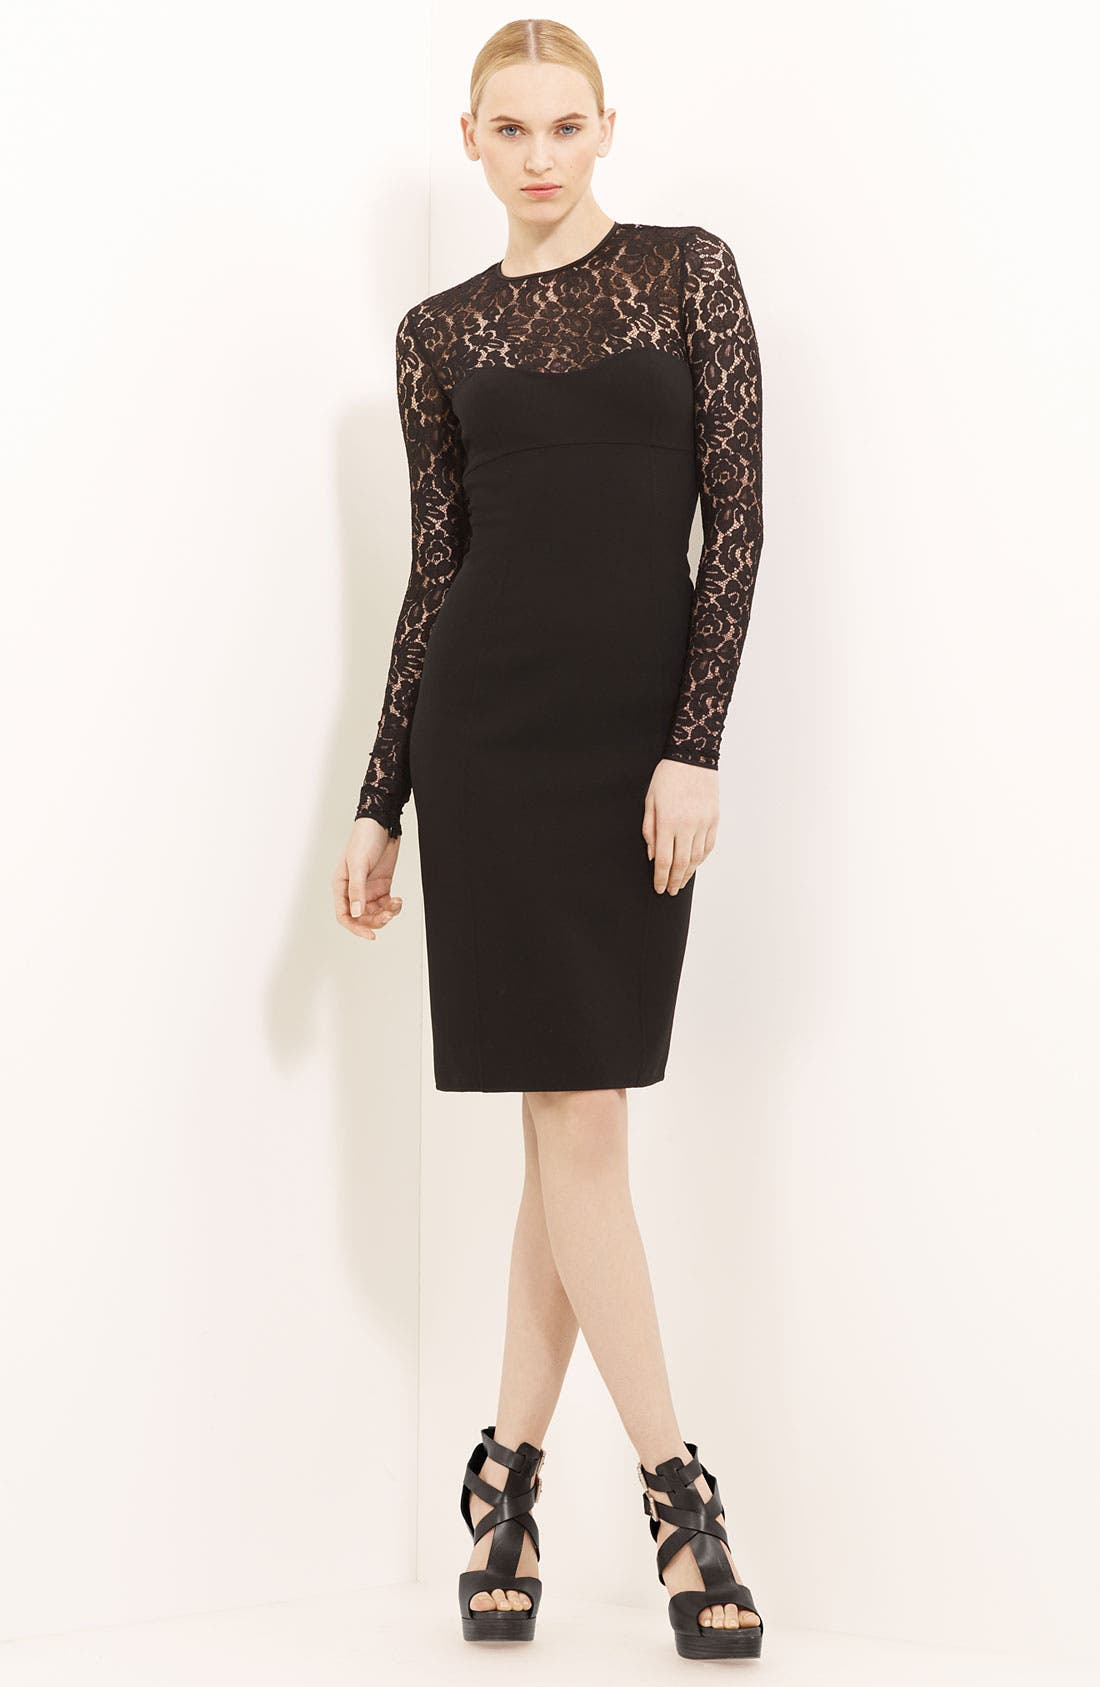 Main Image - Michael Kors Lace & Crepe Dress